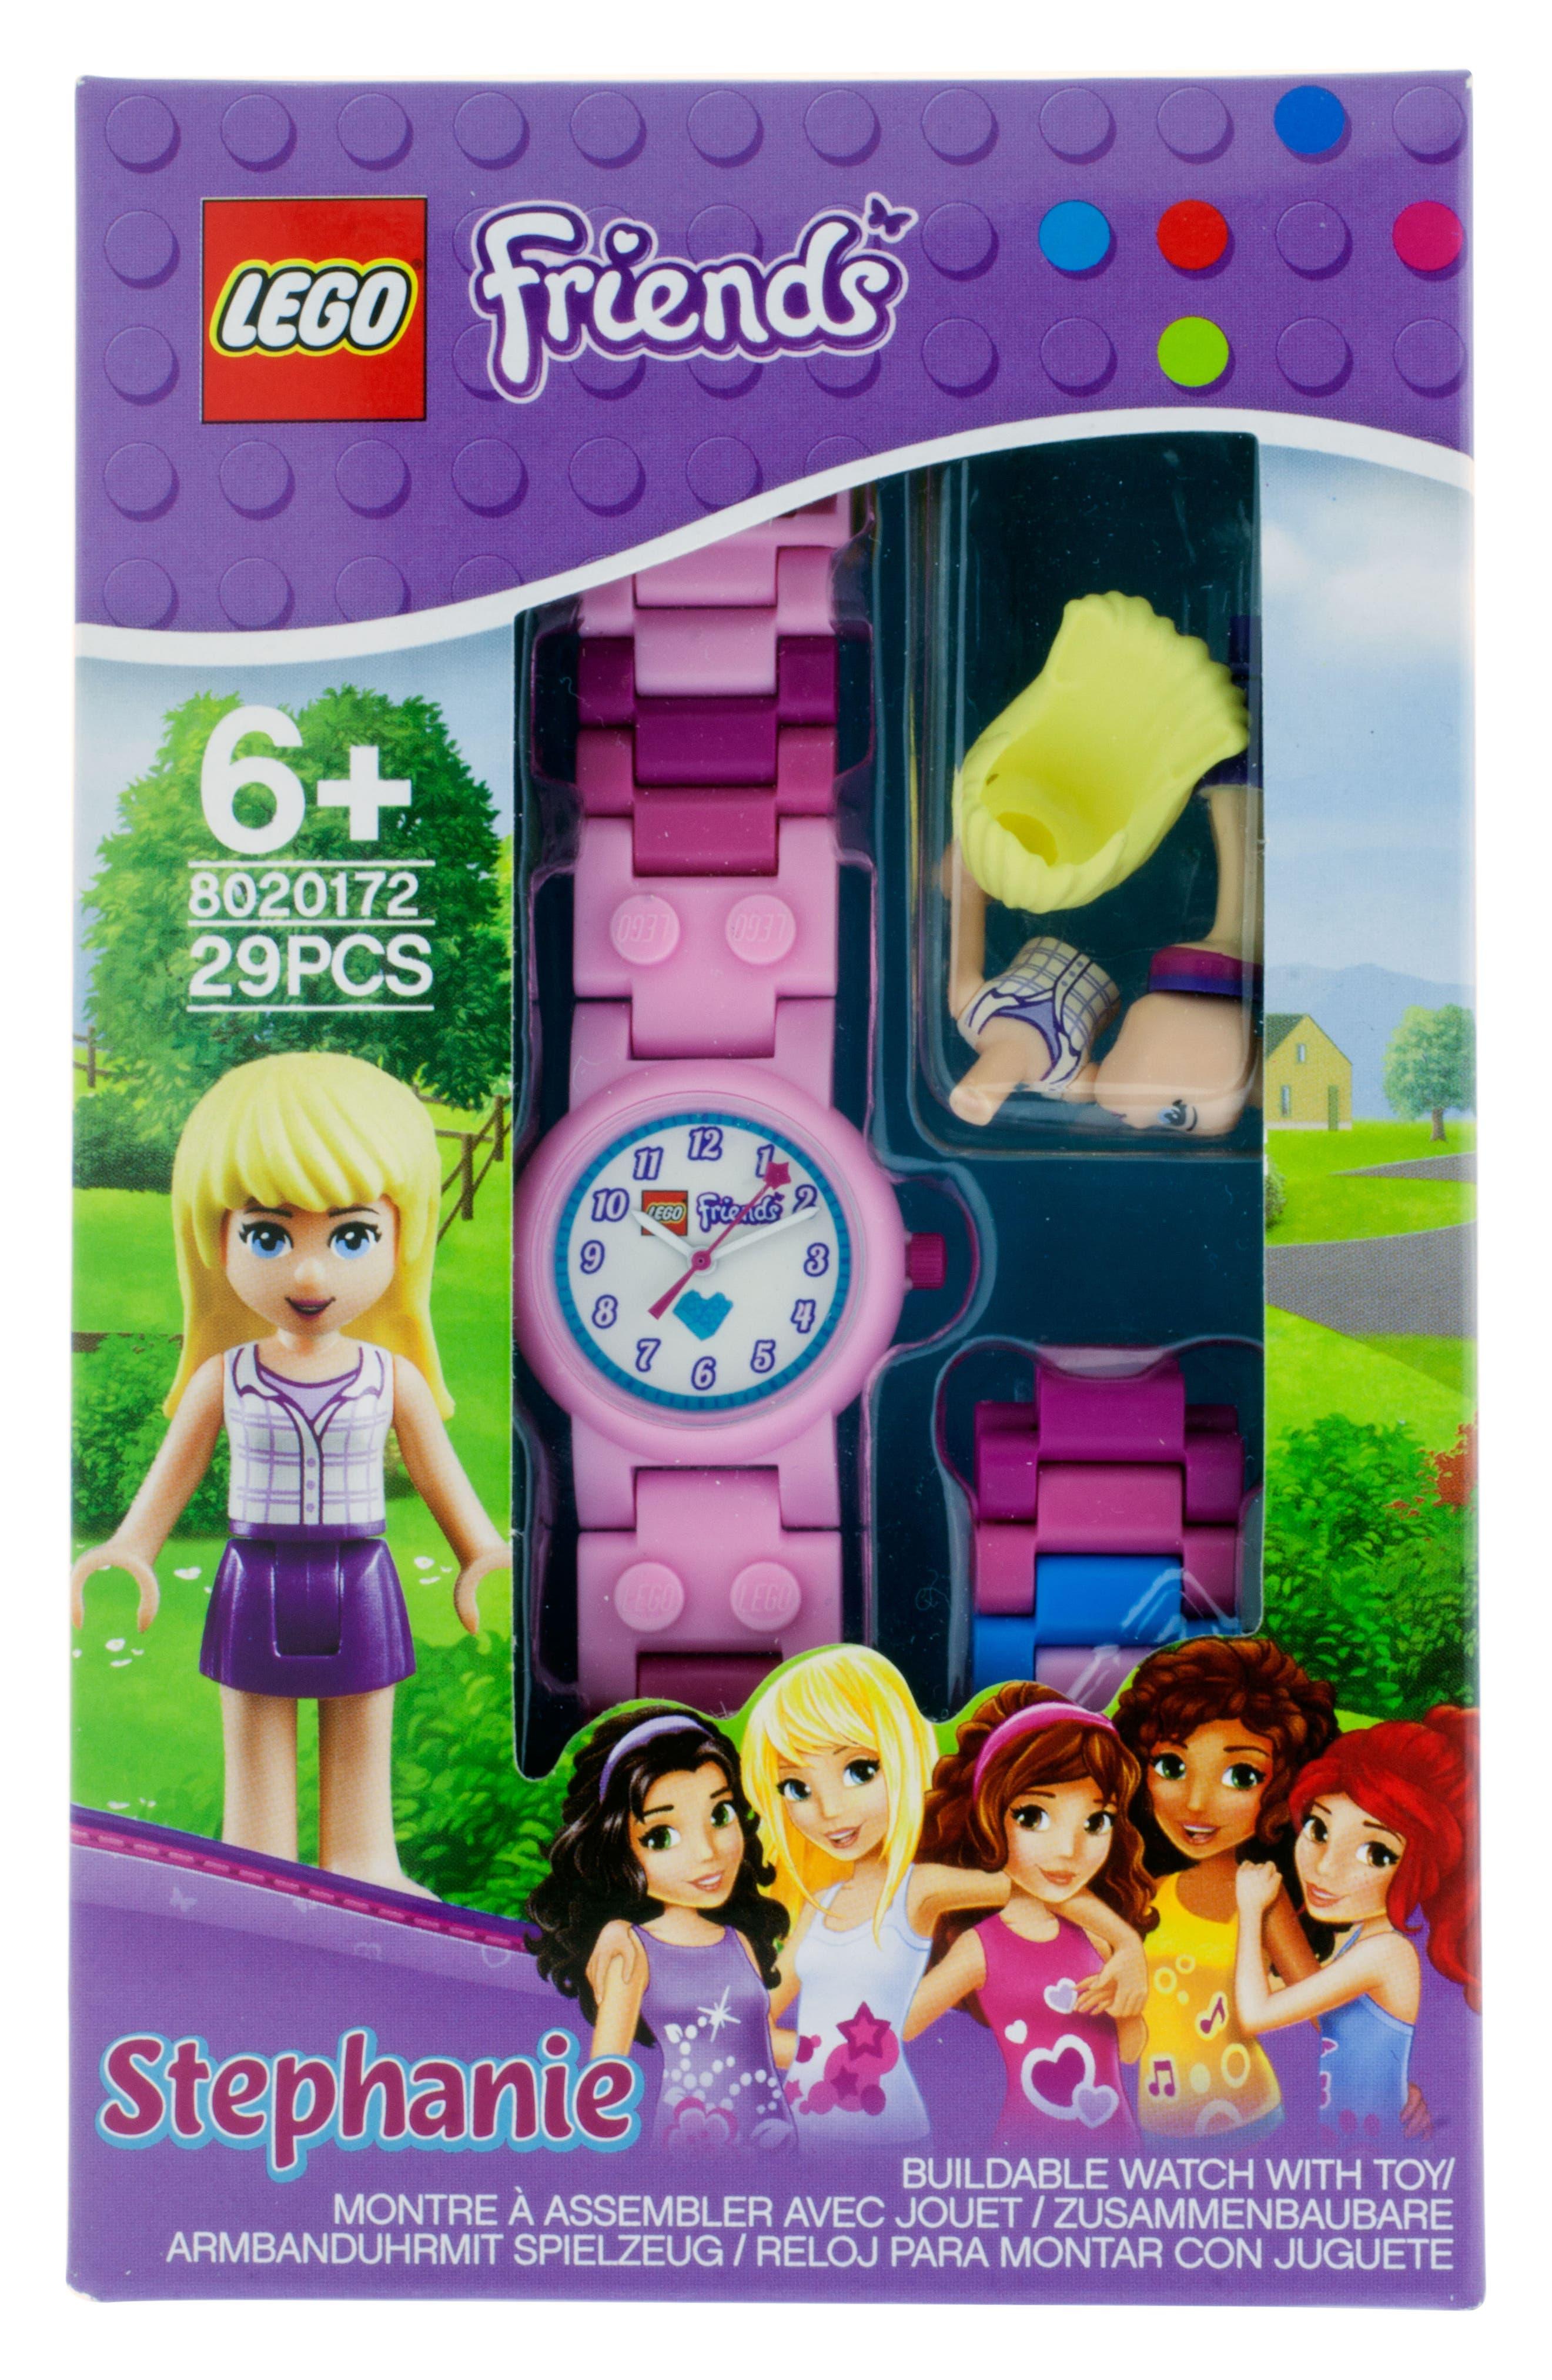 29-Piece LEGO Friends Stephanie Buildable Water-Resistant Watch & Figurine Set,                             Alternate thumbnail 3, color,                             650